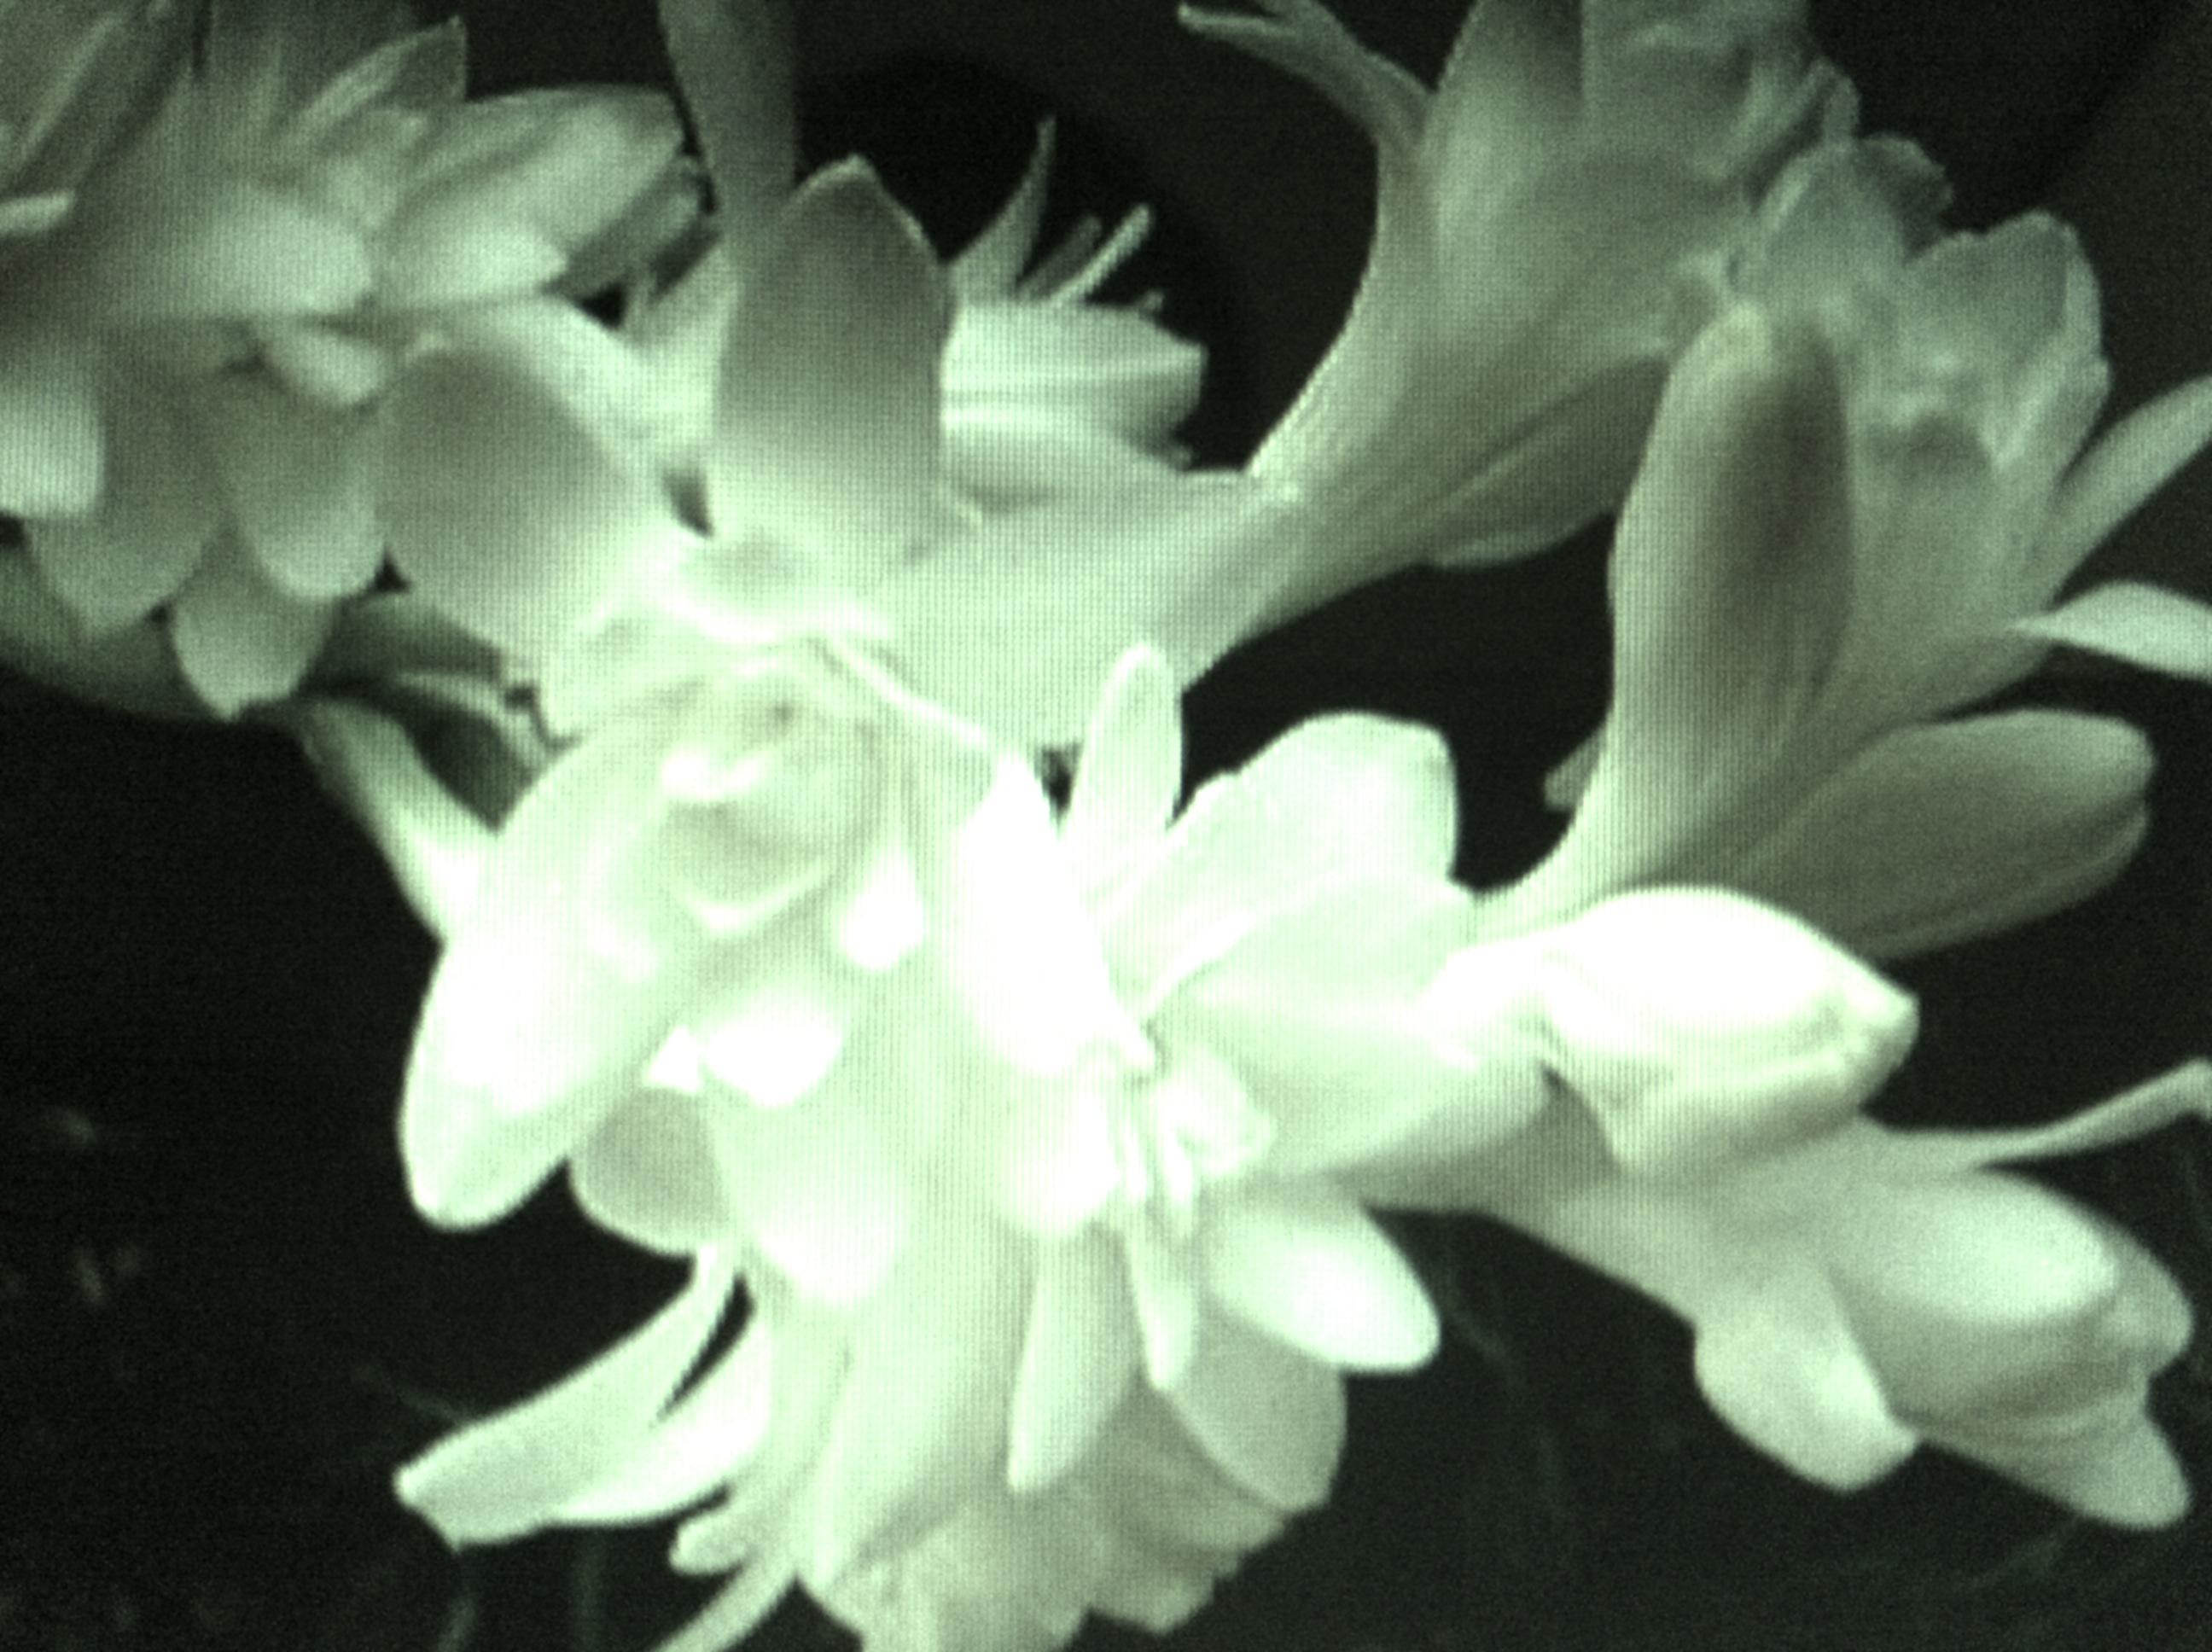 Six Tuberoses The Black Narcissus